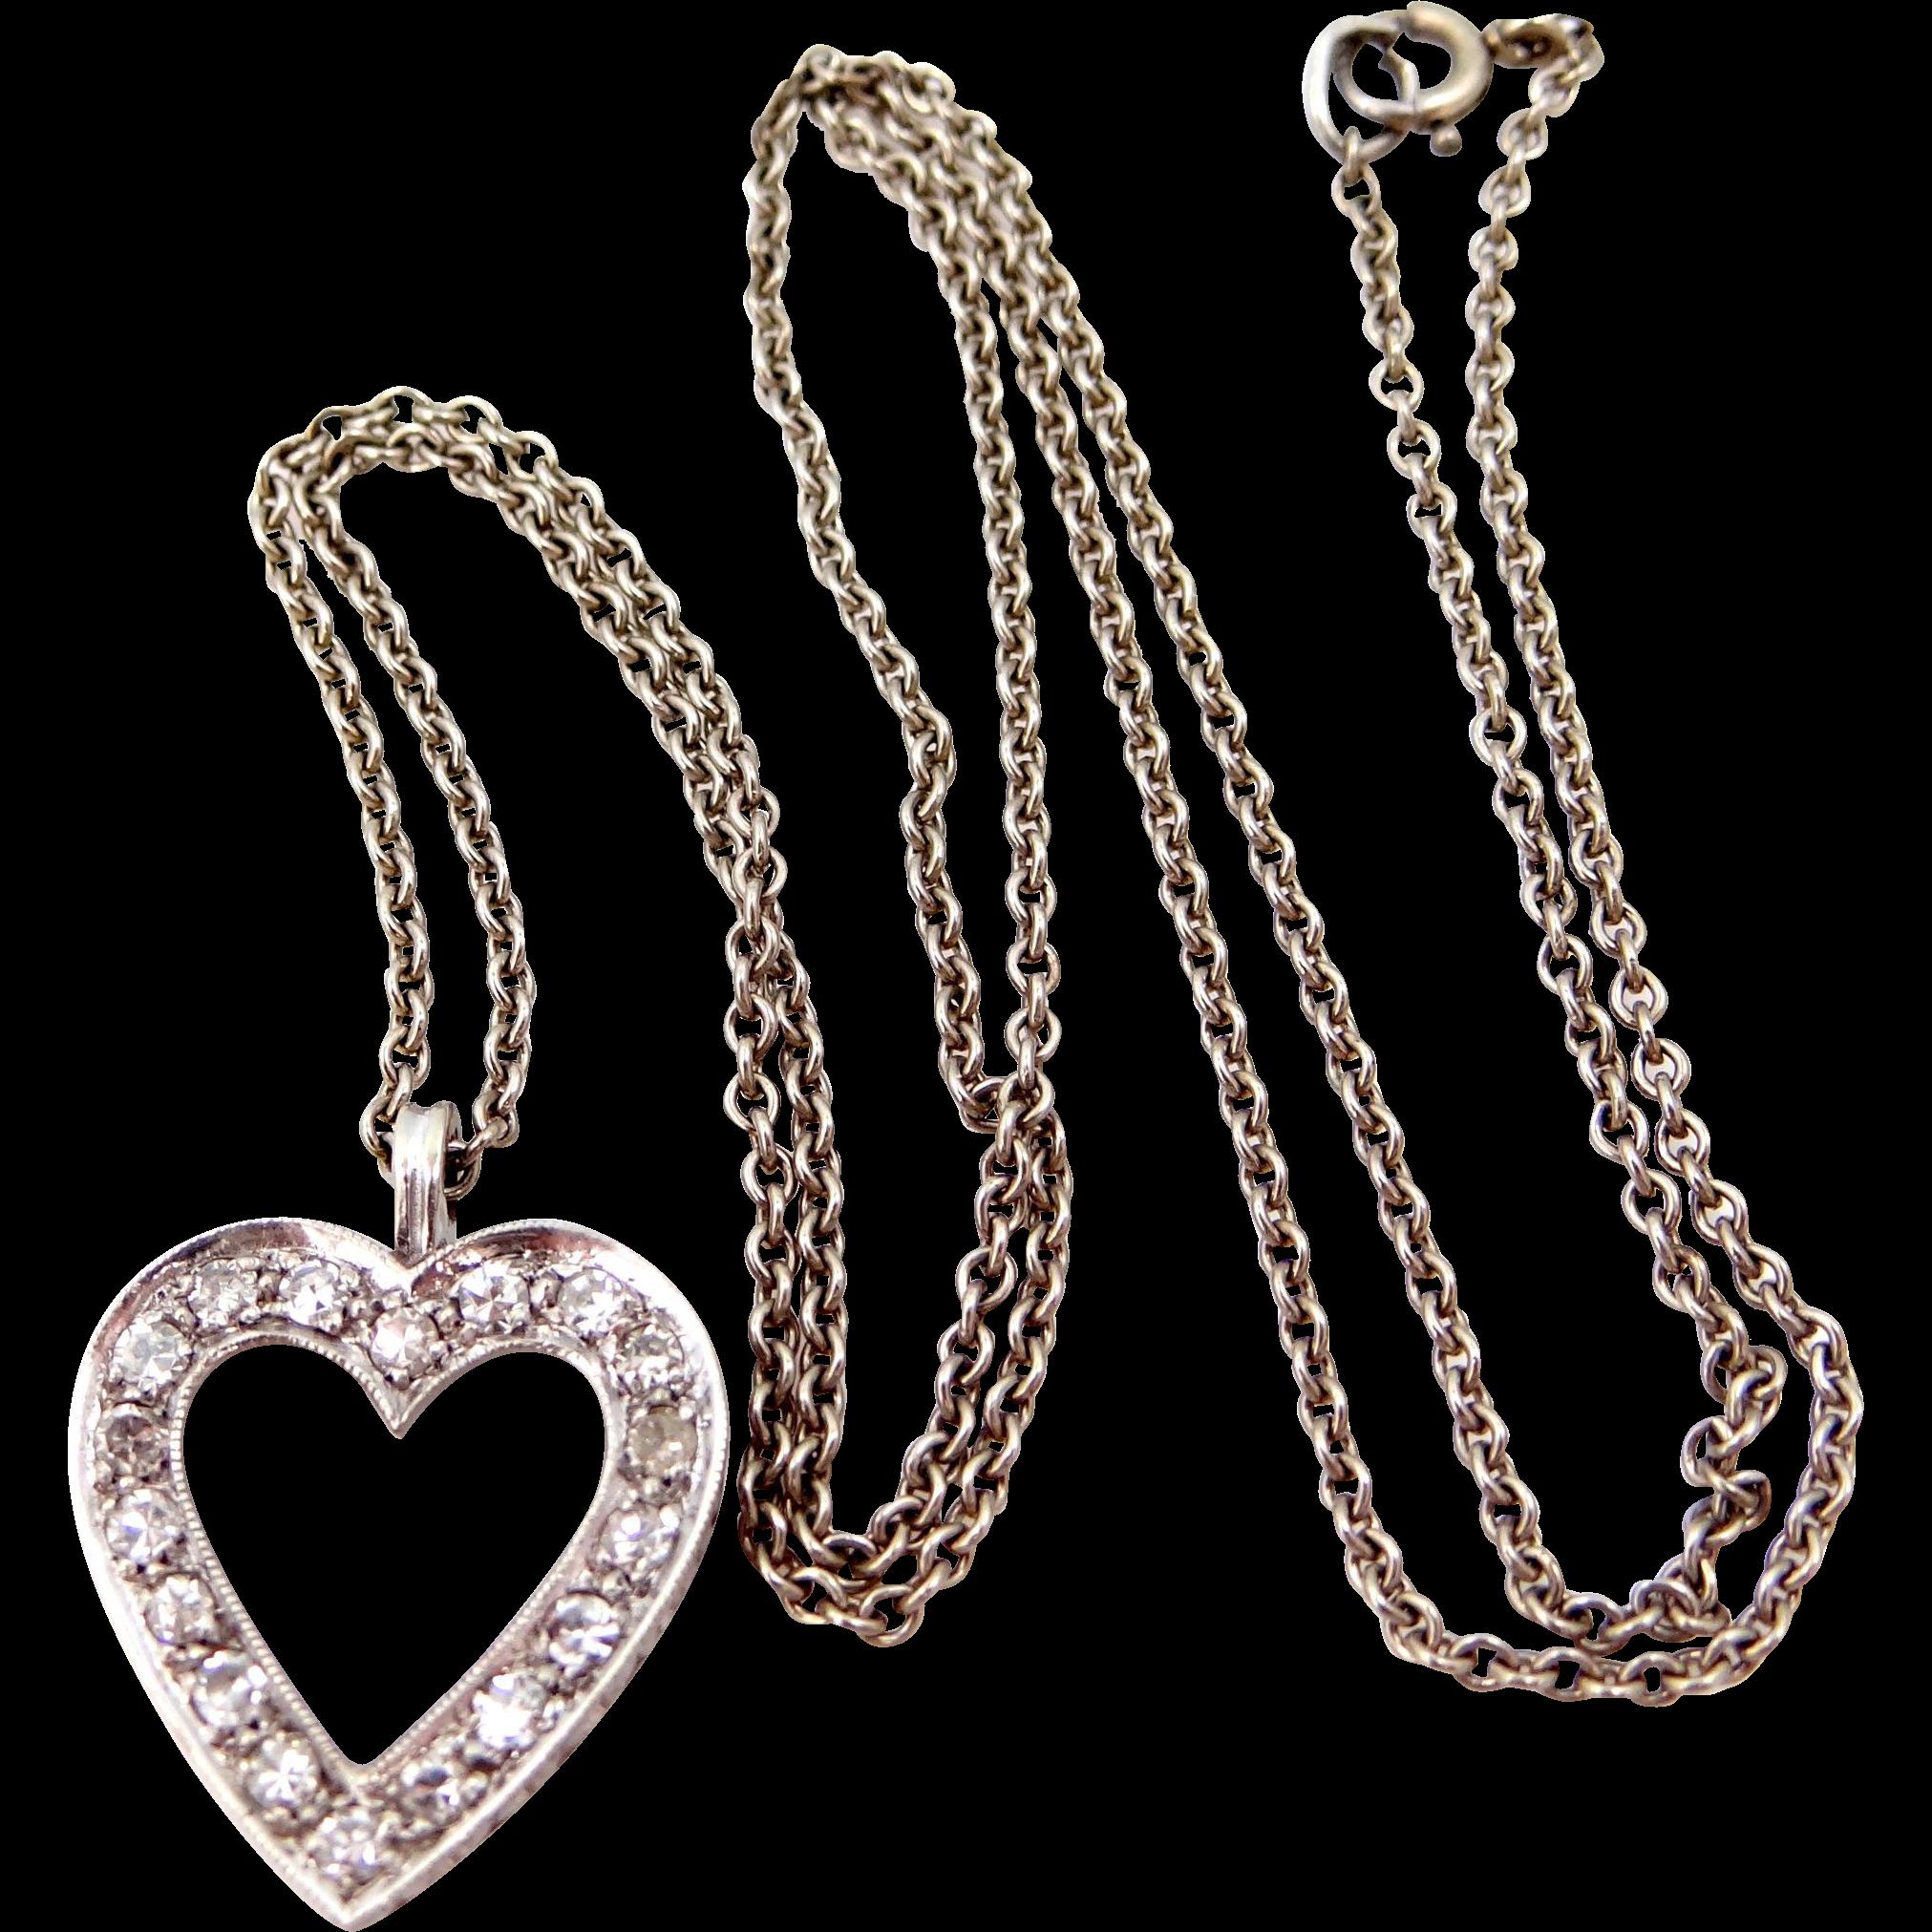 14k White Gold & Diamonds Heart Necklace